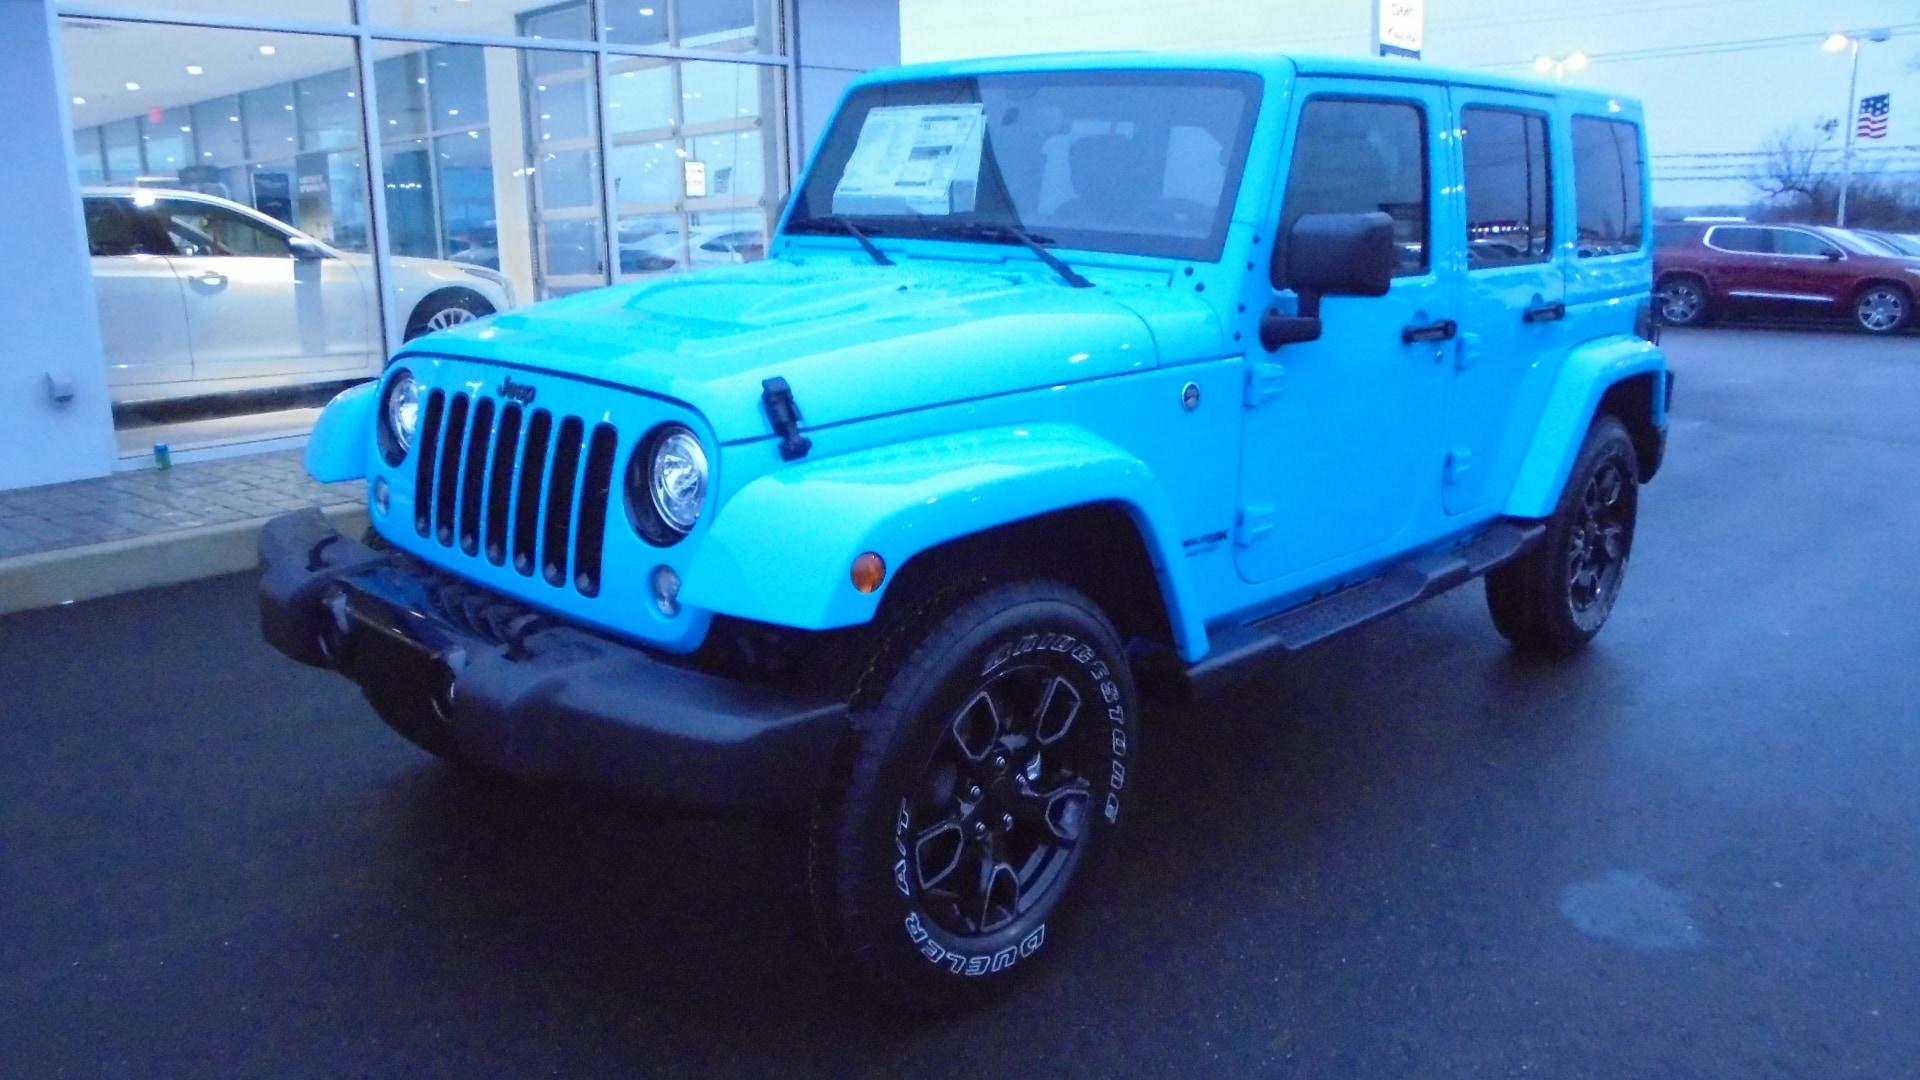 New Jeep U003e New Jeep Wrangler Unlimited U003e New 2018 Jeep Wrangler Unlimited  WRANGLER JK UNLIMITED ALTITUDE 4X4